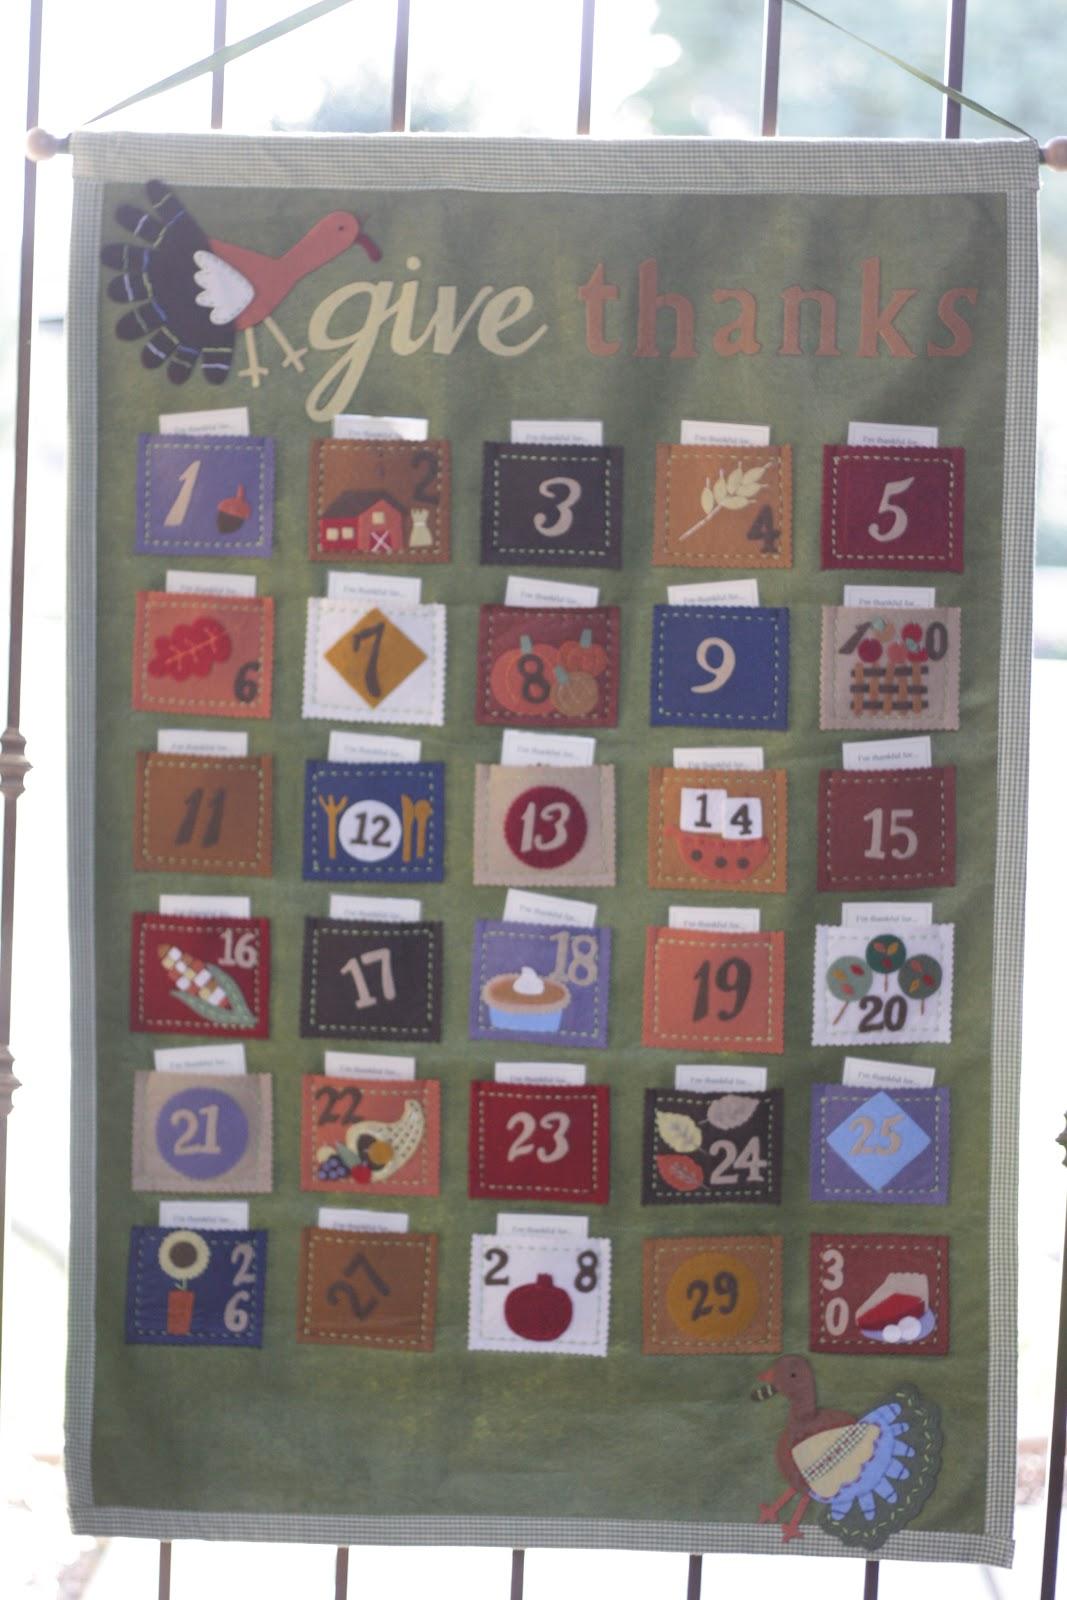 Thanksgiving Countdown Calendar The Red Balloon